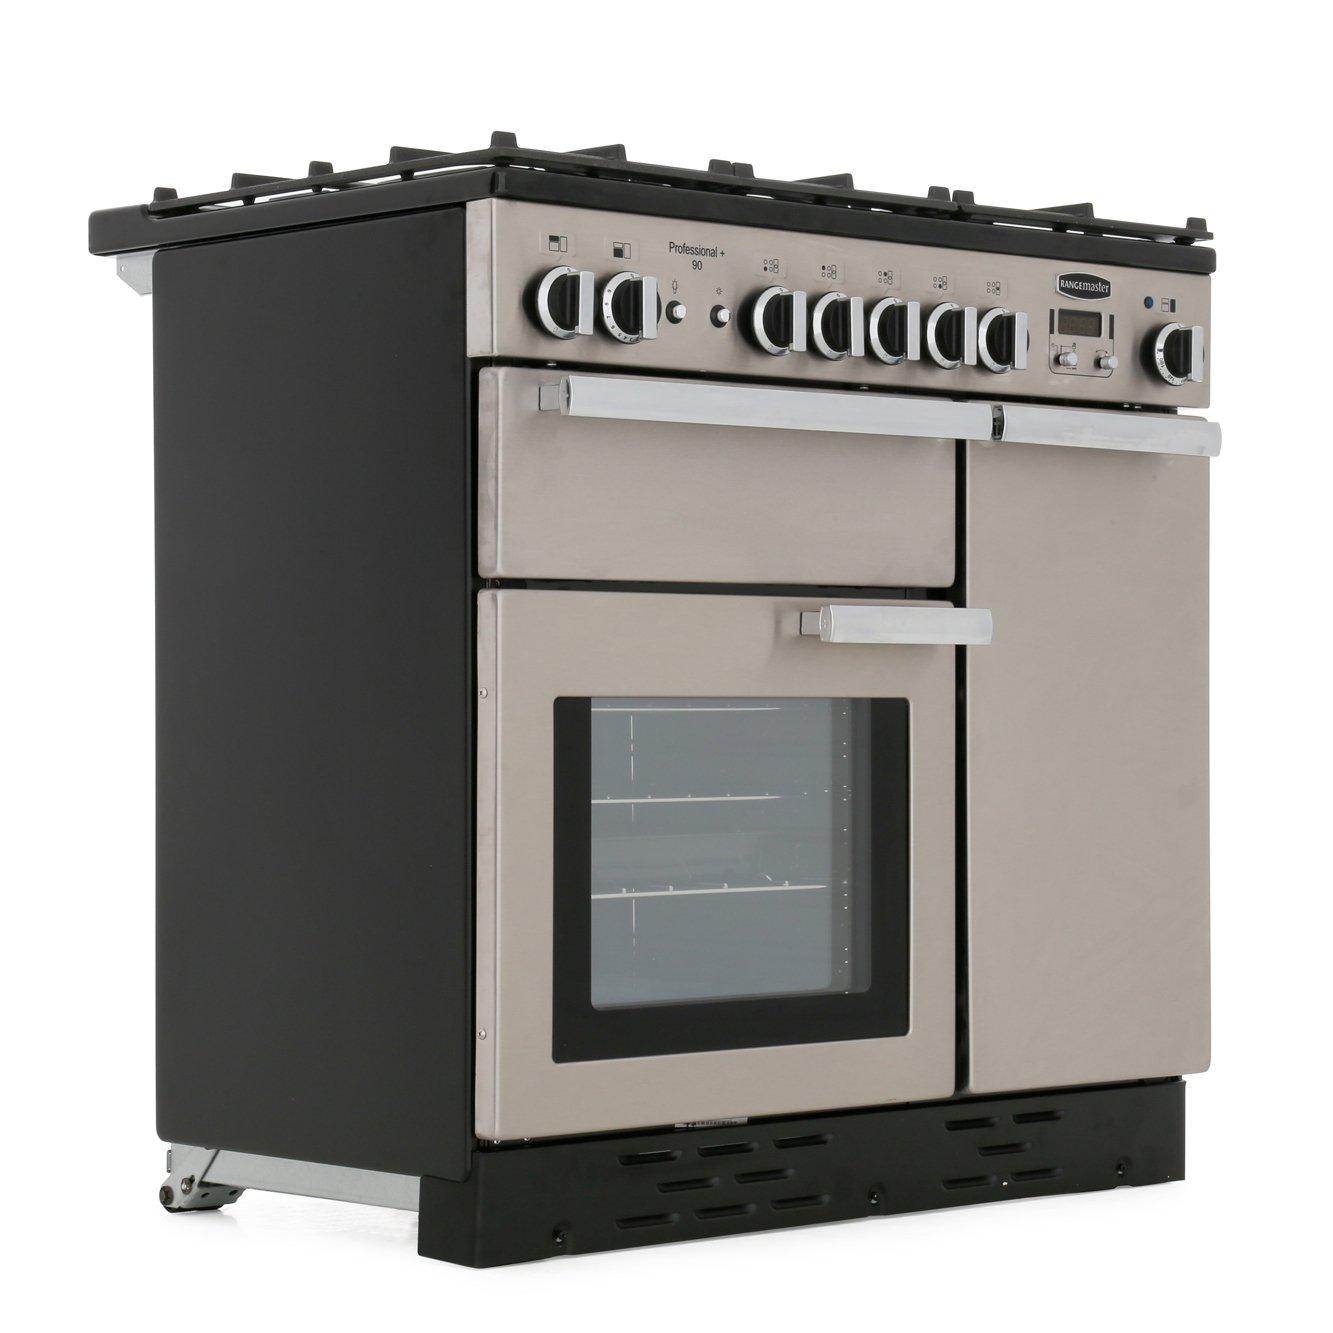 Rangemaster 90cm gas range cooker